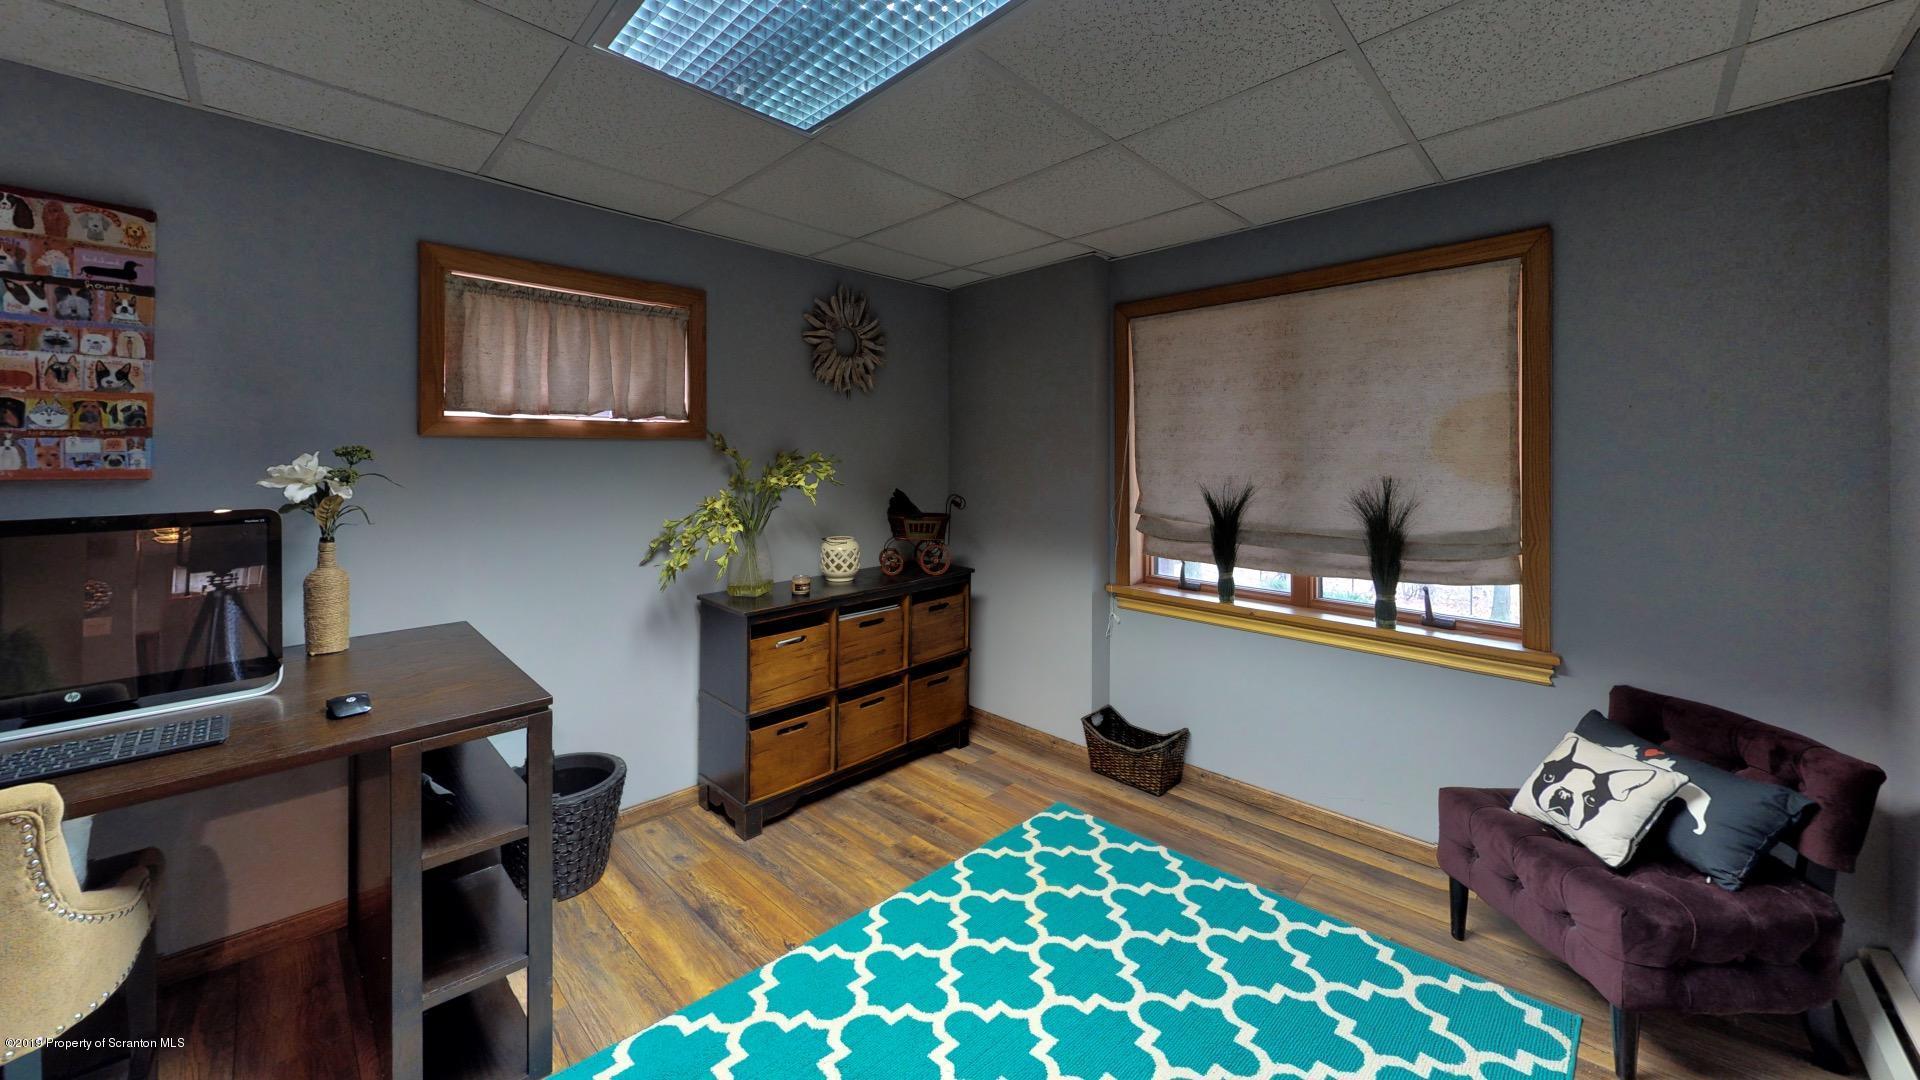 12 Ridgeview Dr, Scranton, Pennsylvania 18504, 3 Bedrooms Bedrooms, 7 Rooms Rooms,3 BathroomsBathrooms,Single Family,For Sale,Ridgeview,19-5583